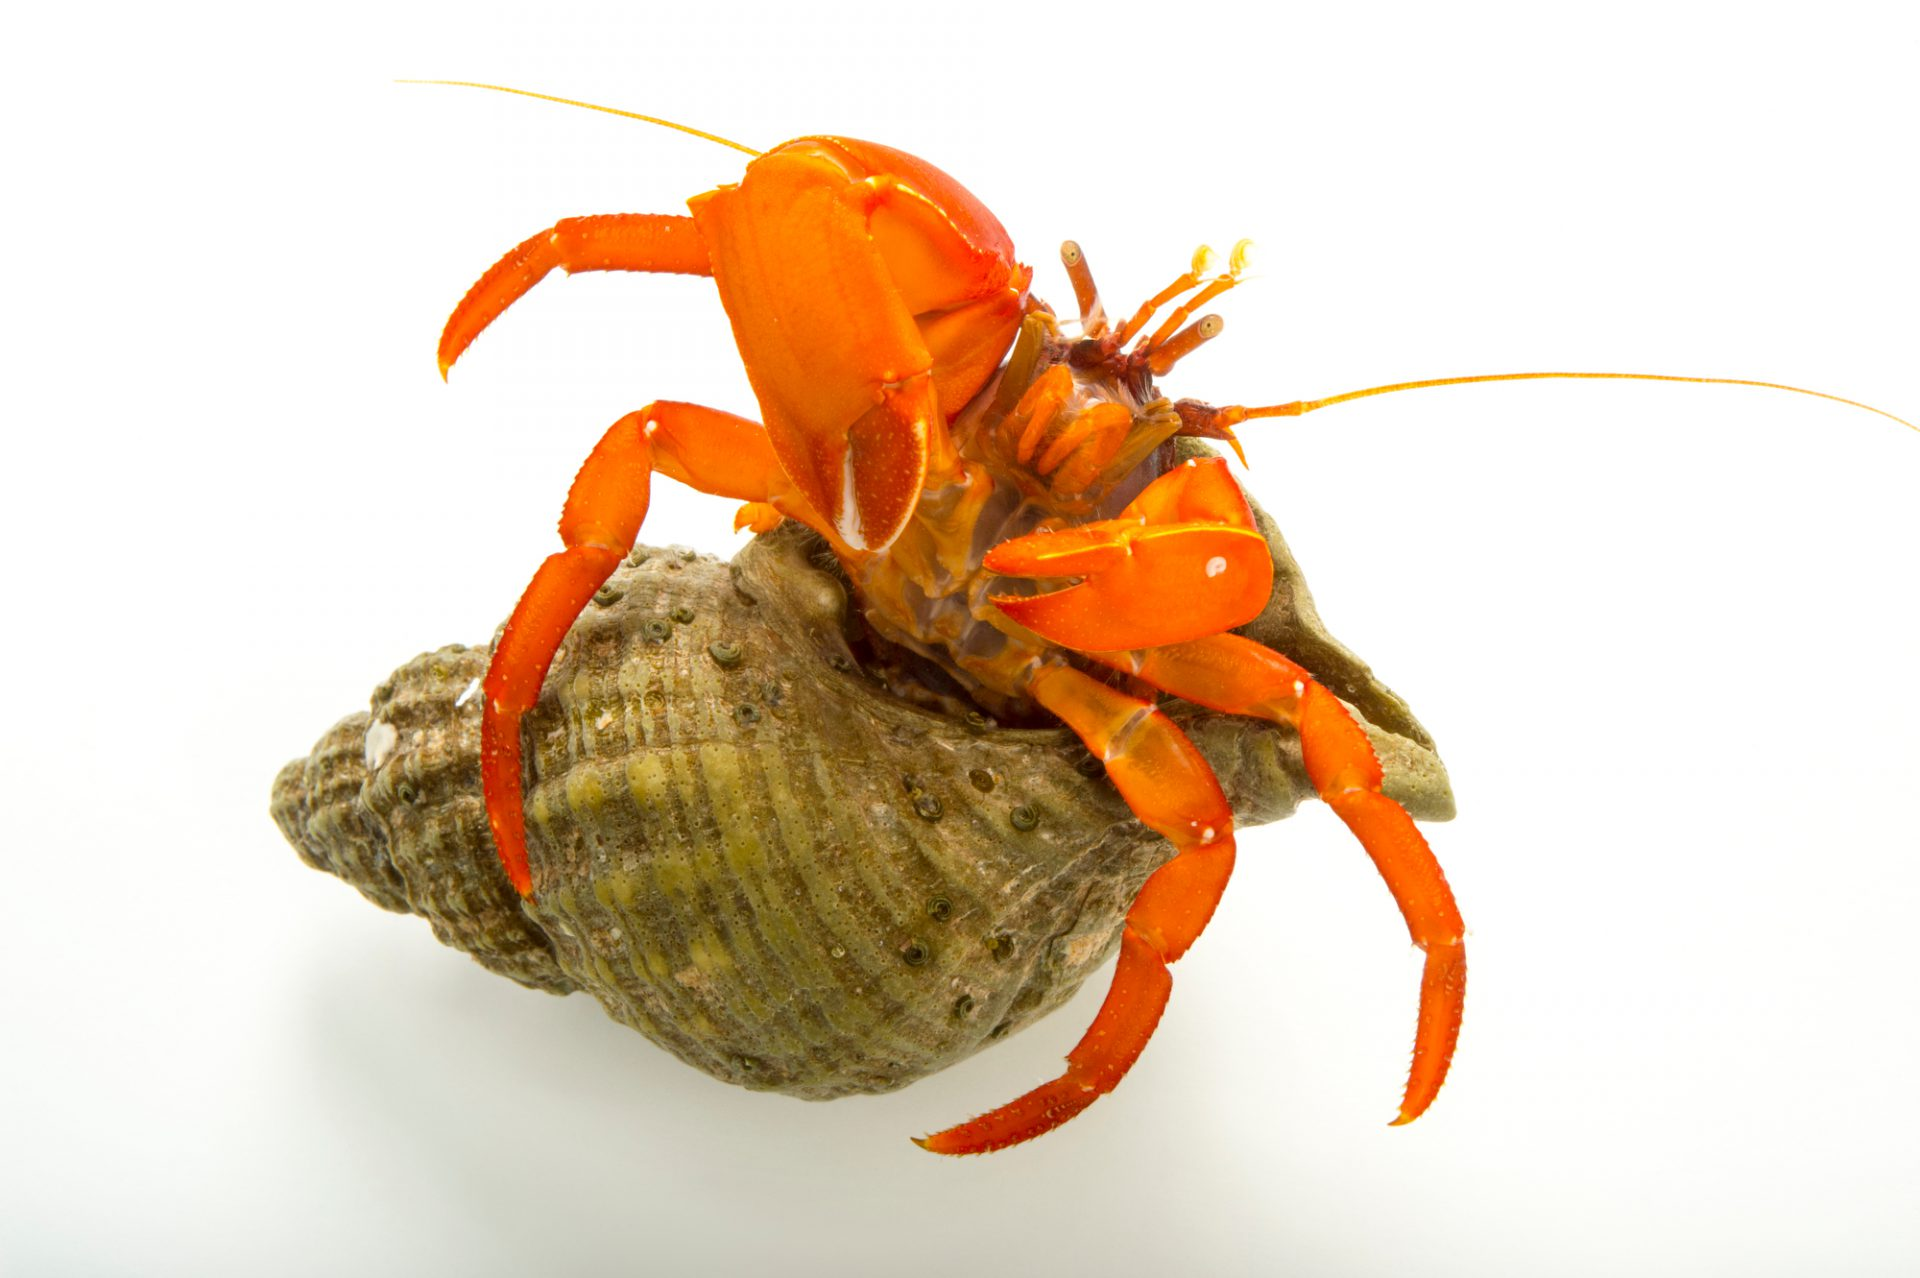 Photo: Pacific red hermit crab, Elasdochirus gilli, at the Alaska SeaLife Center.